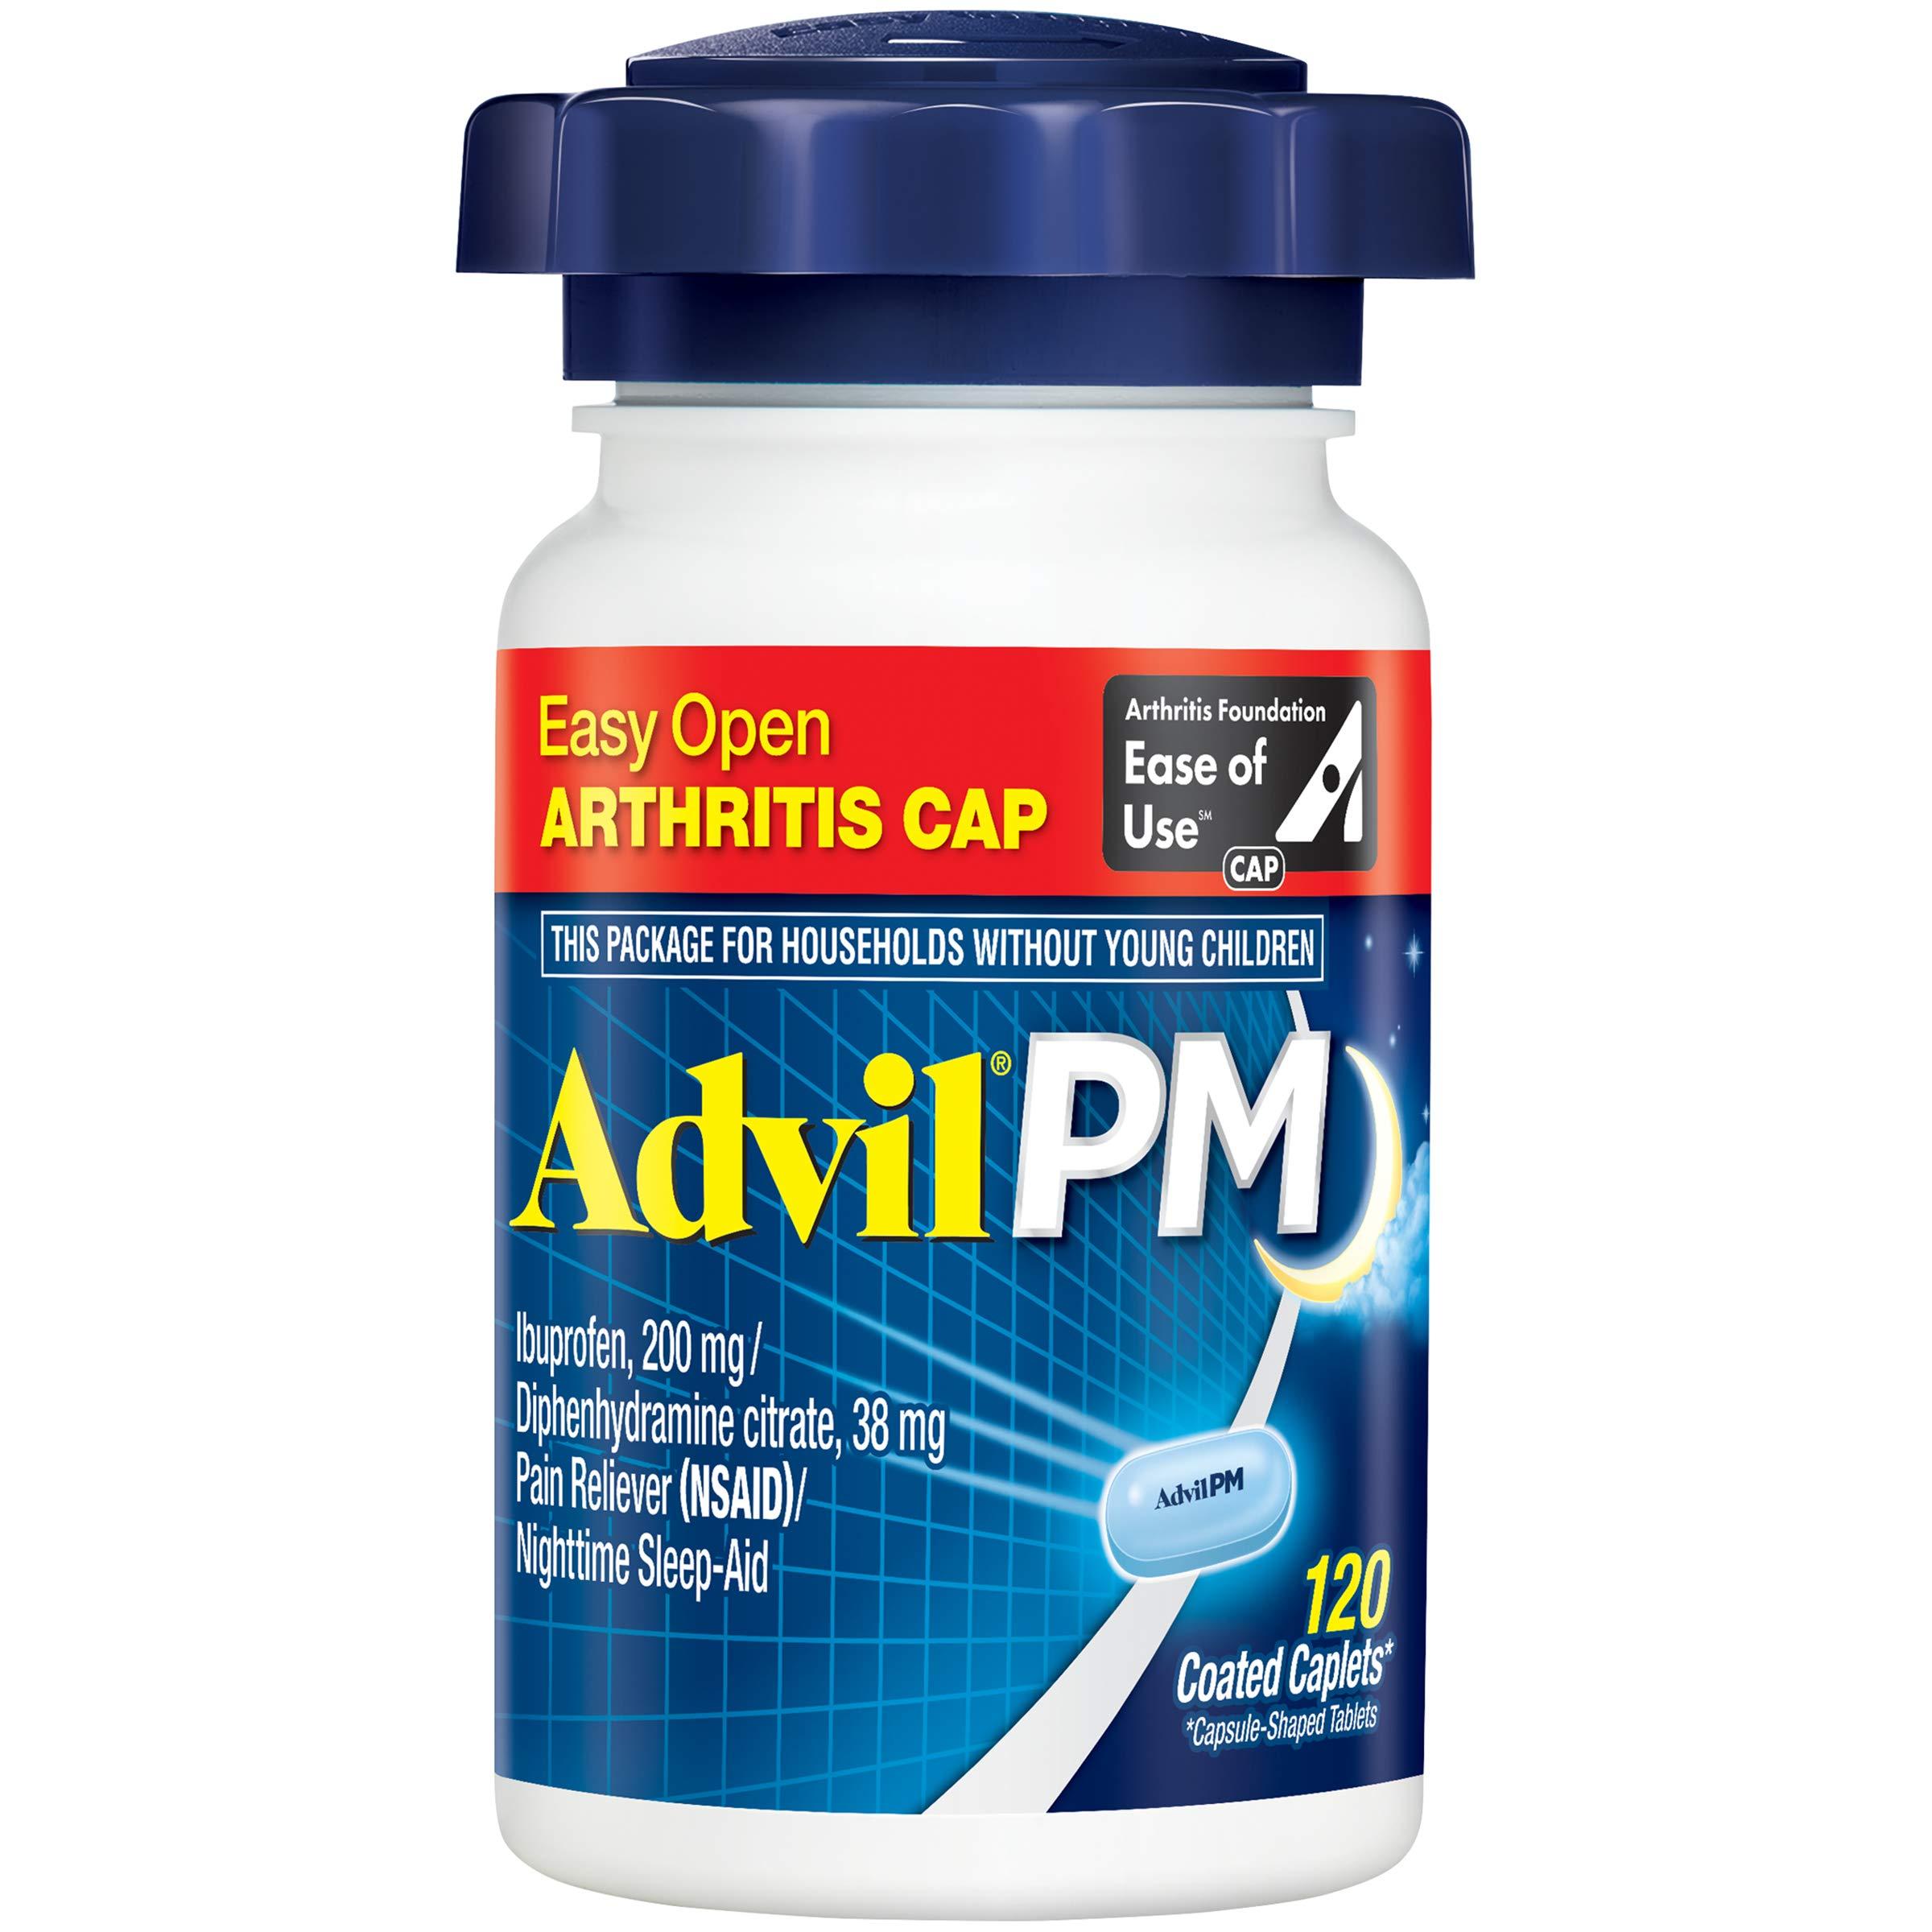 Advil PM (120 Count) Easy Open Arthritis Cap Pain Reliever/Nighttime Sleep Aid Caplet, 200mg Ibuprofen, 38mg Diphenhydramine by Advil